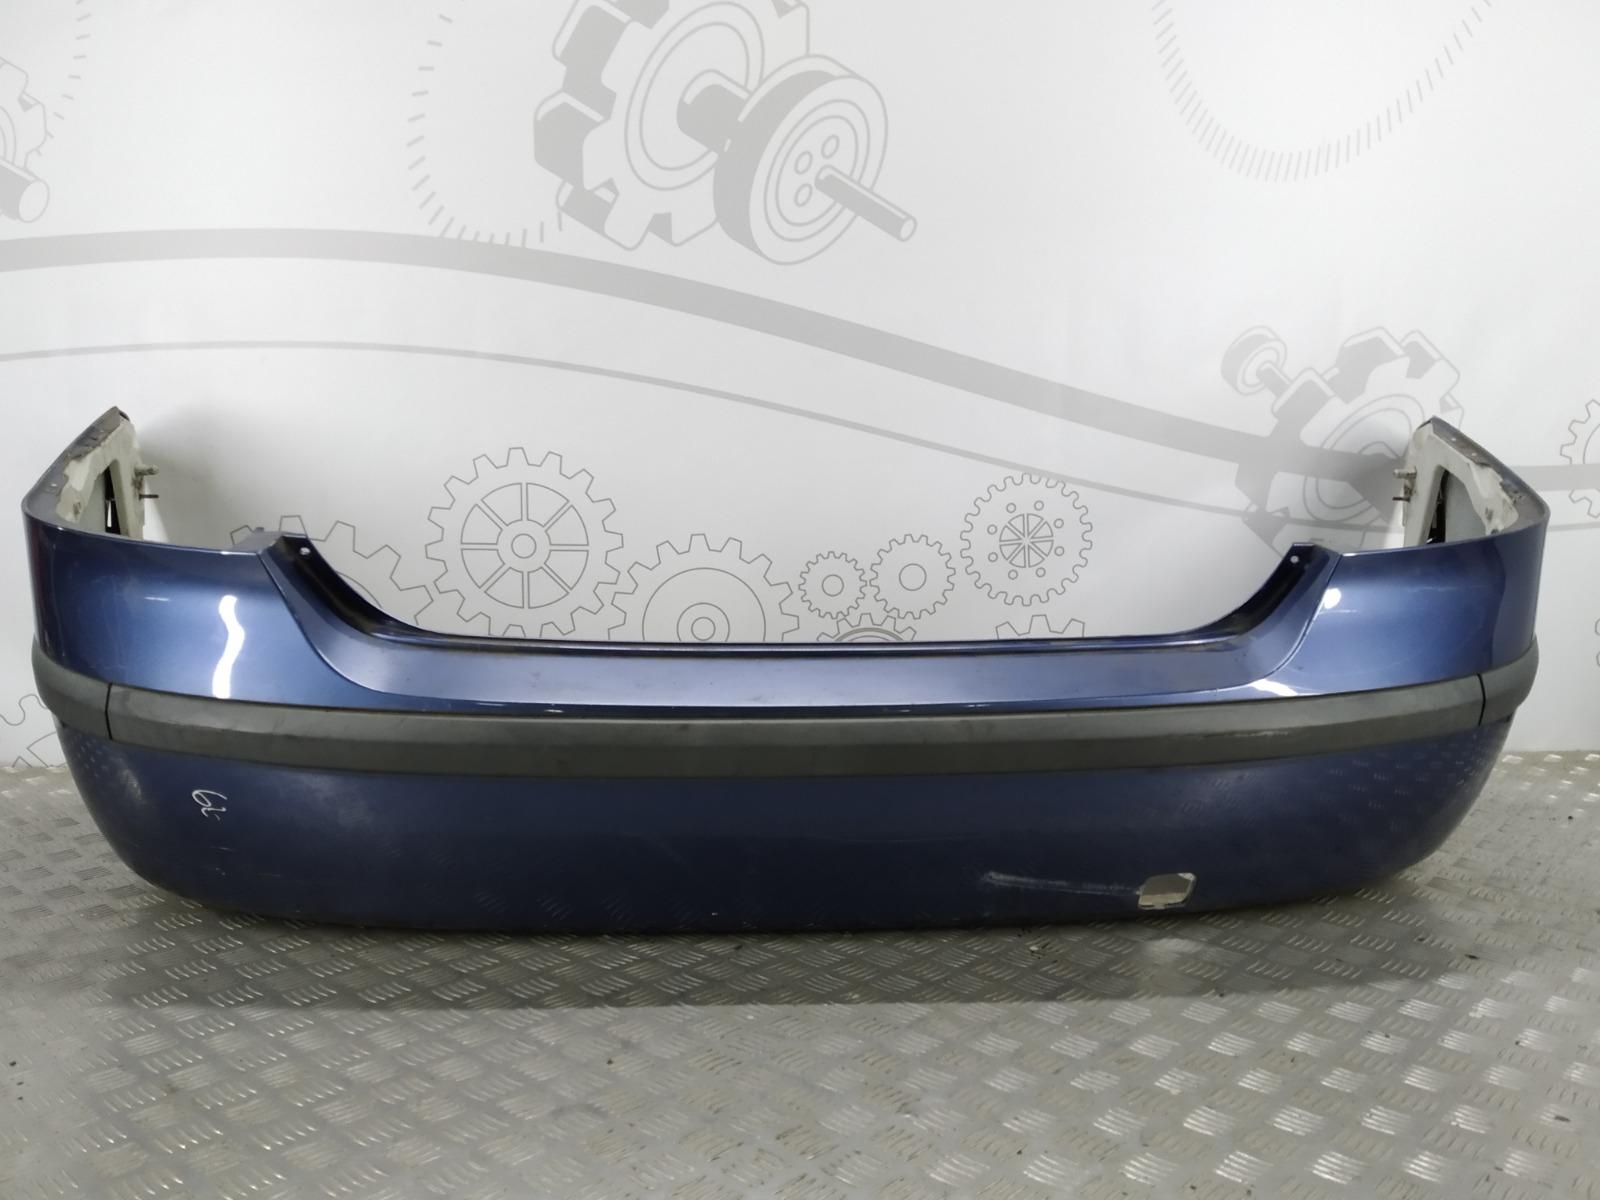 Бампер задний Ford Focus 1.6 I 2005 (б/у)